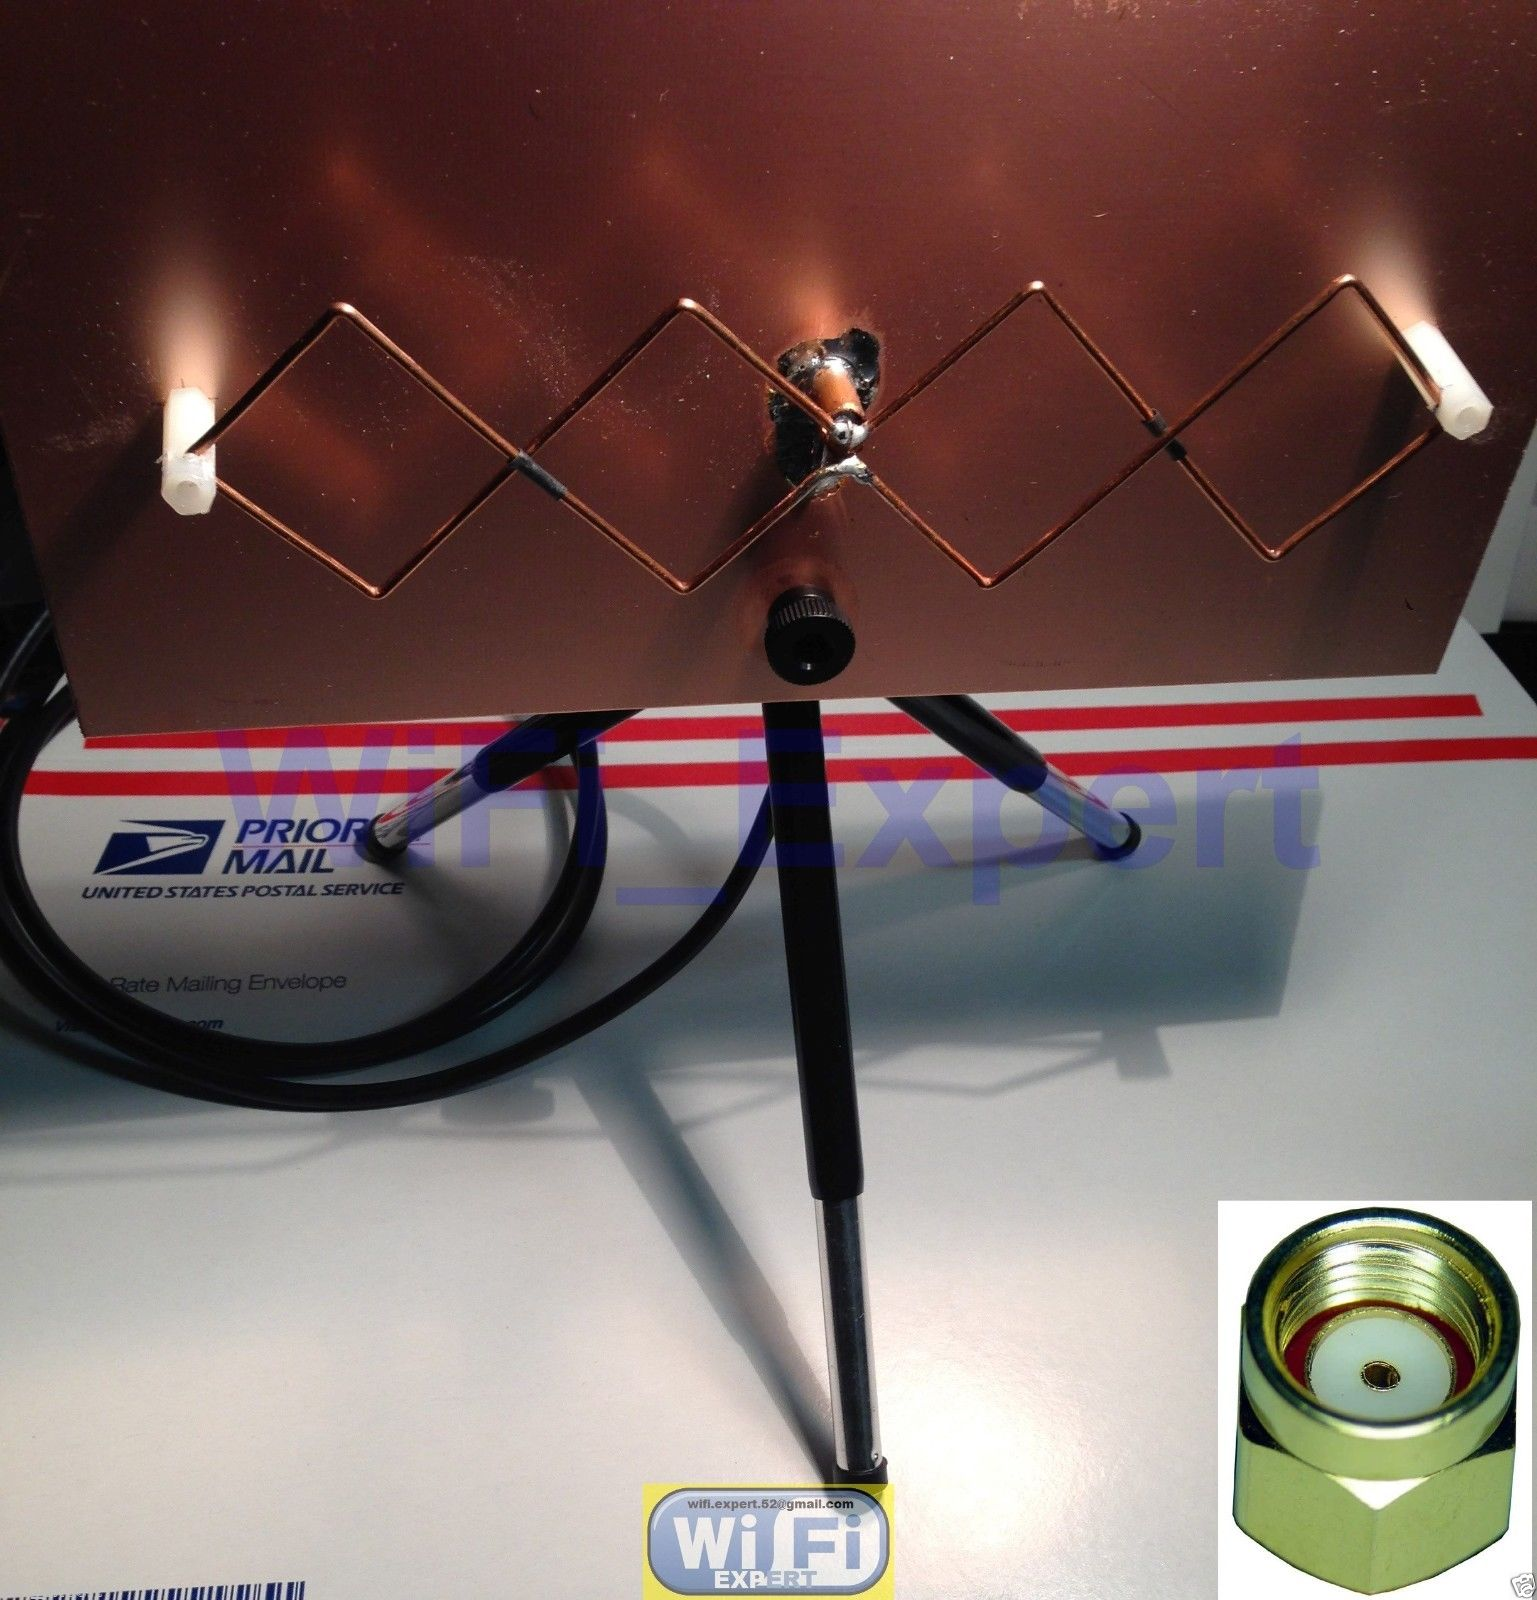 WiFi Antenna MACH 1 Double Biquad Wireless Booster Long Range GET FREE  INTERNET